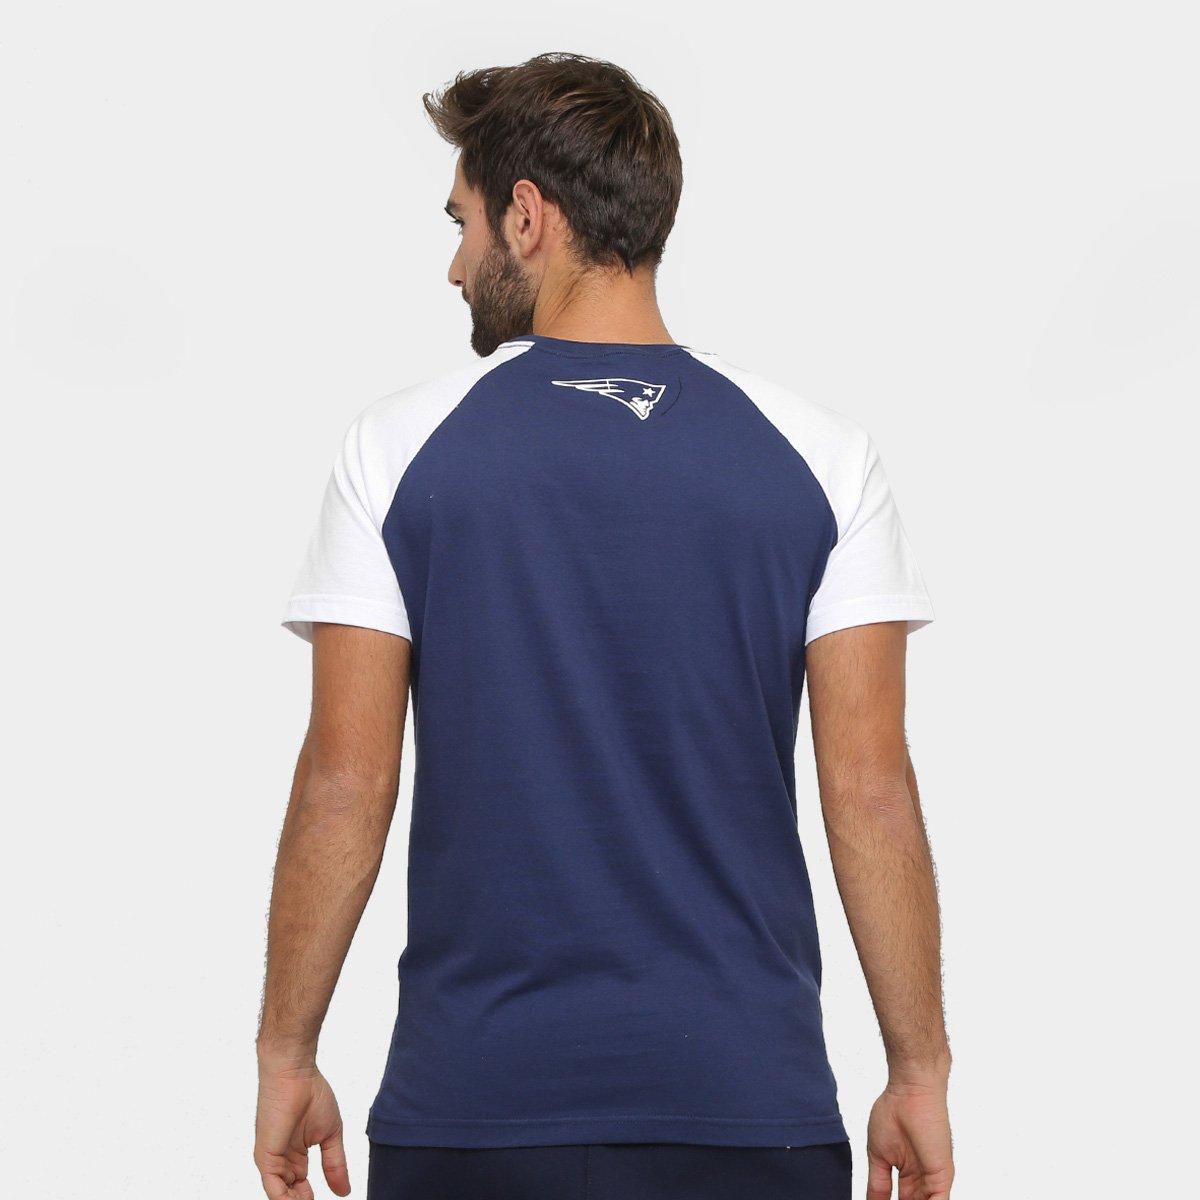 ... Camiseta New England Patriots New Era NFL Big Logo Raglan Masculina ... 0b66c3cc418b5